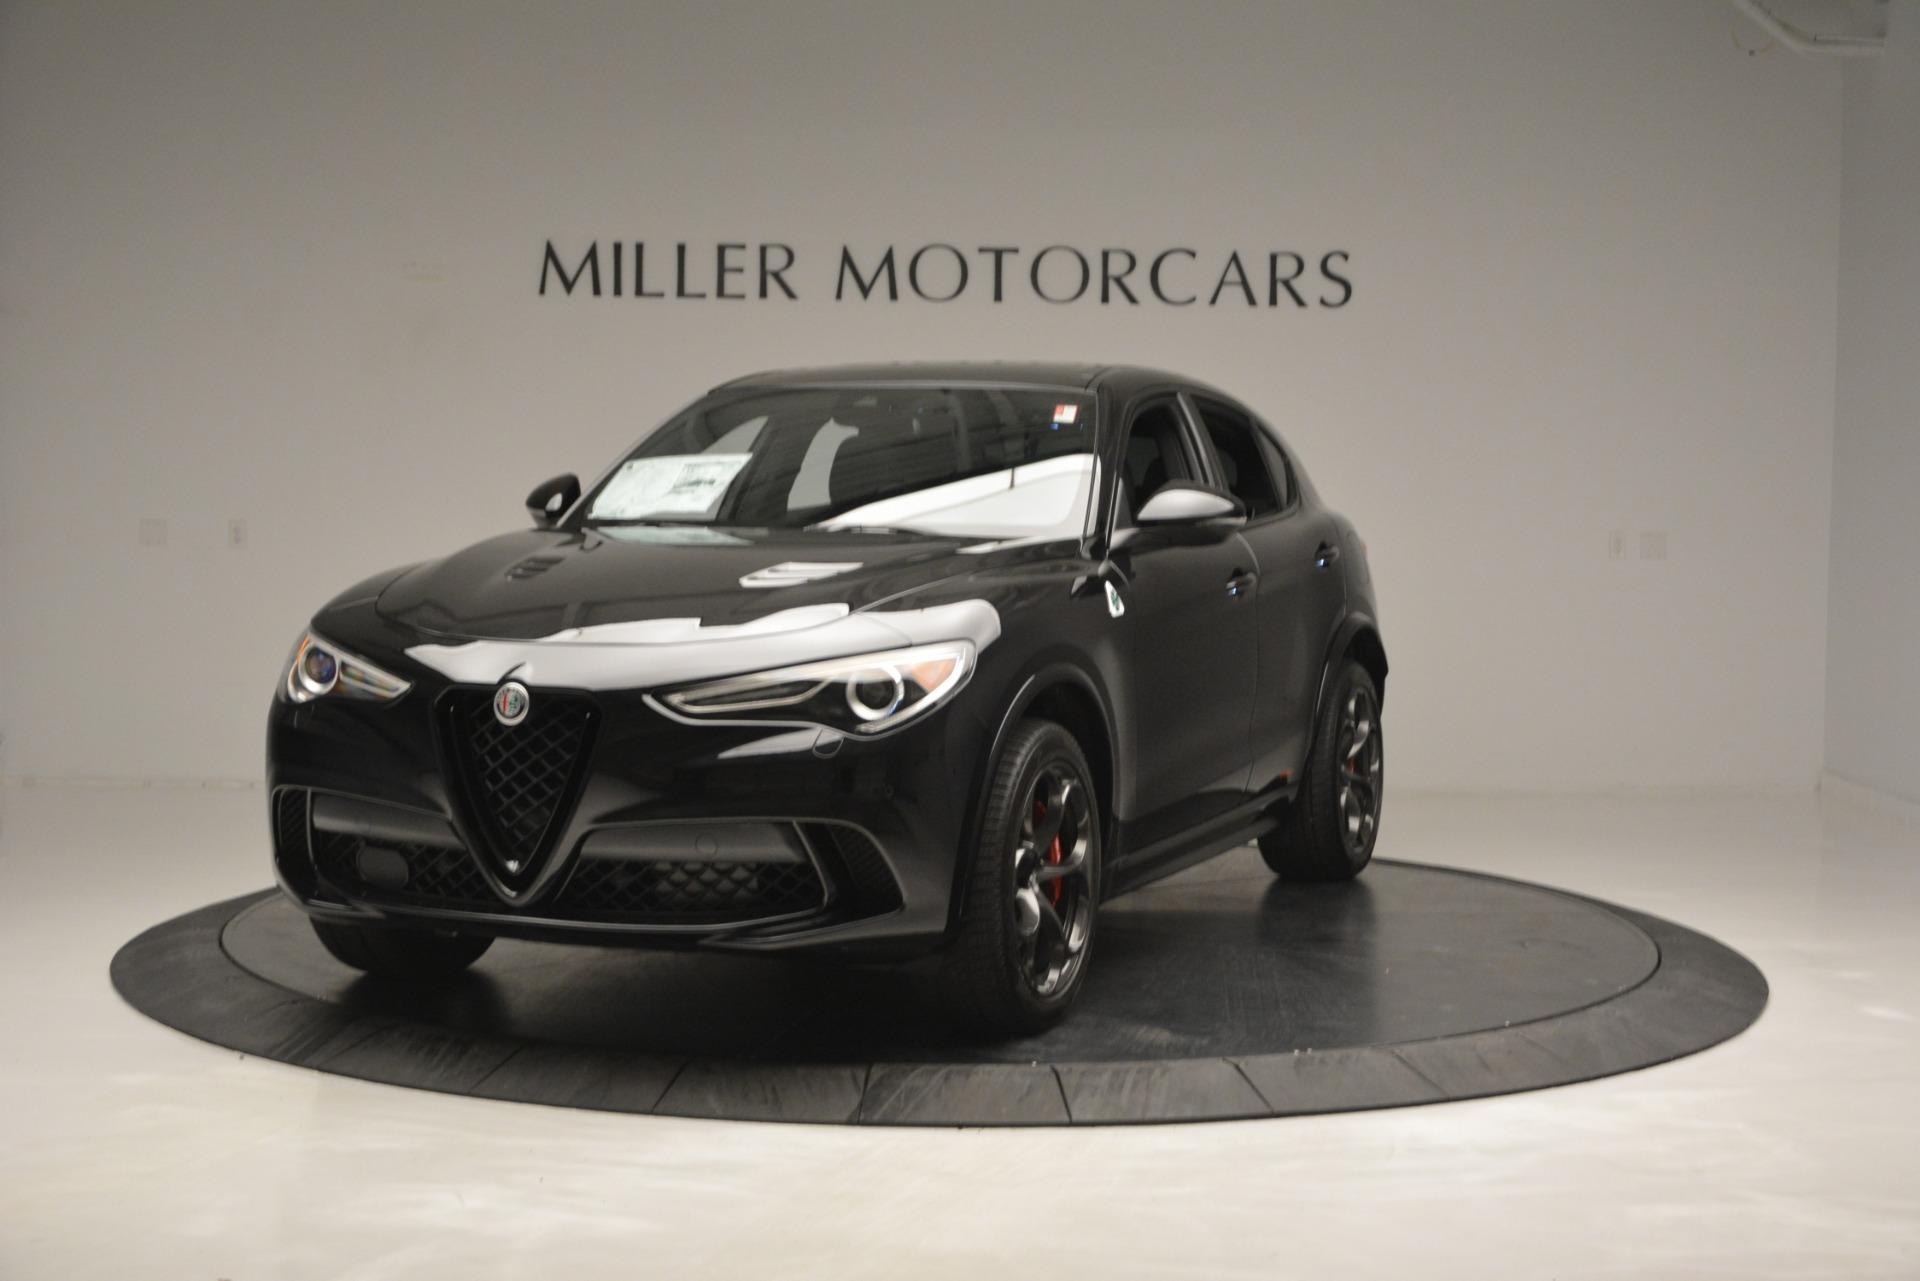 2018 Alfa Romeo Stelvio Quadrifoglio Q4 Stock L463 For Sale Near